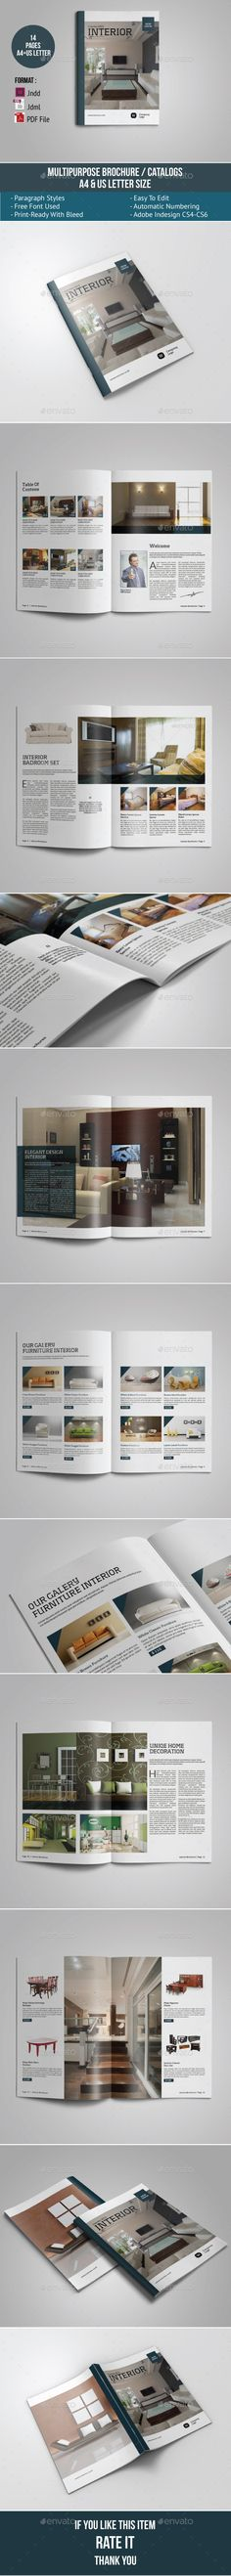 Catalogs \/ Brochure Brochures, Catalog and Brochure template - interior design brochure template